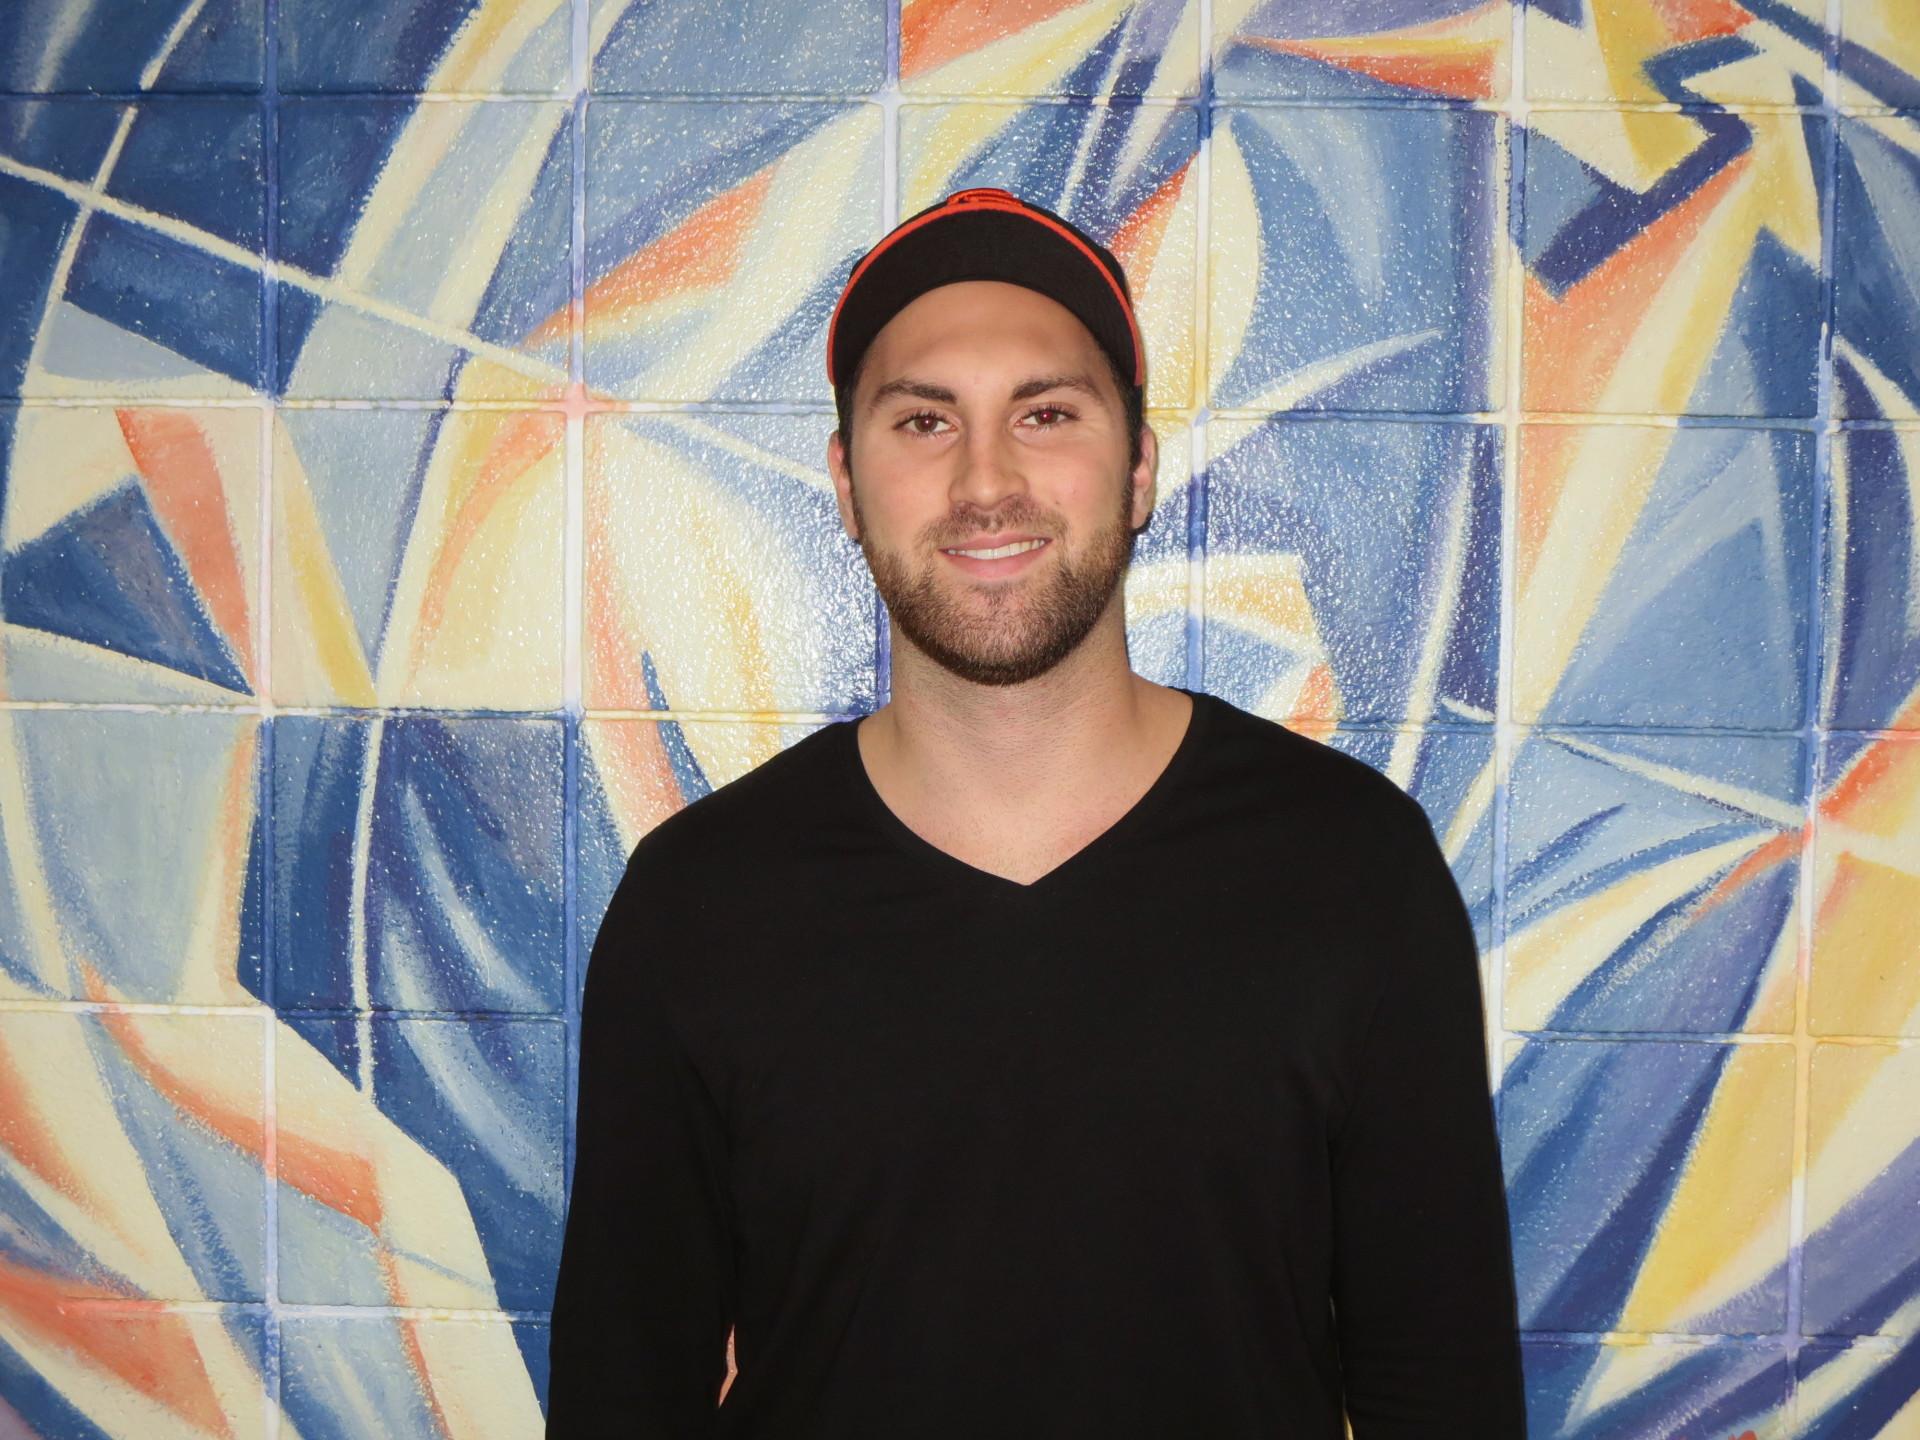 Dustin Kwinter